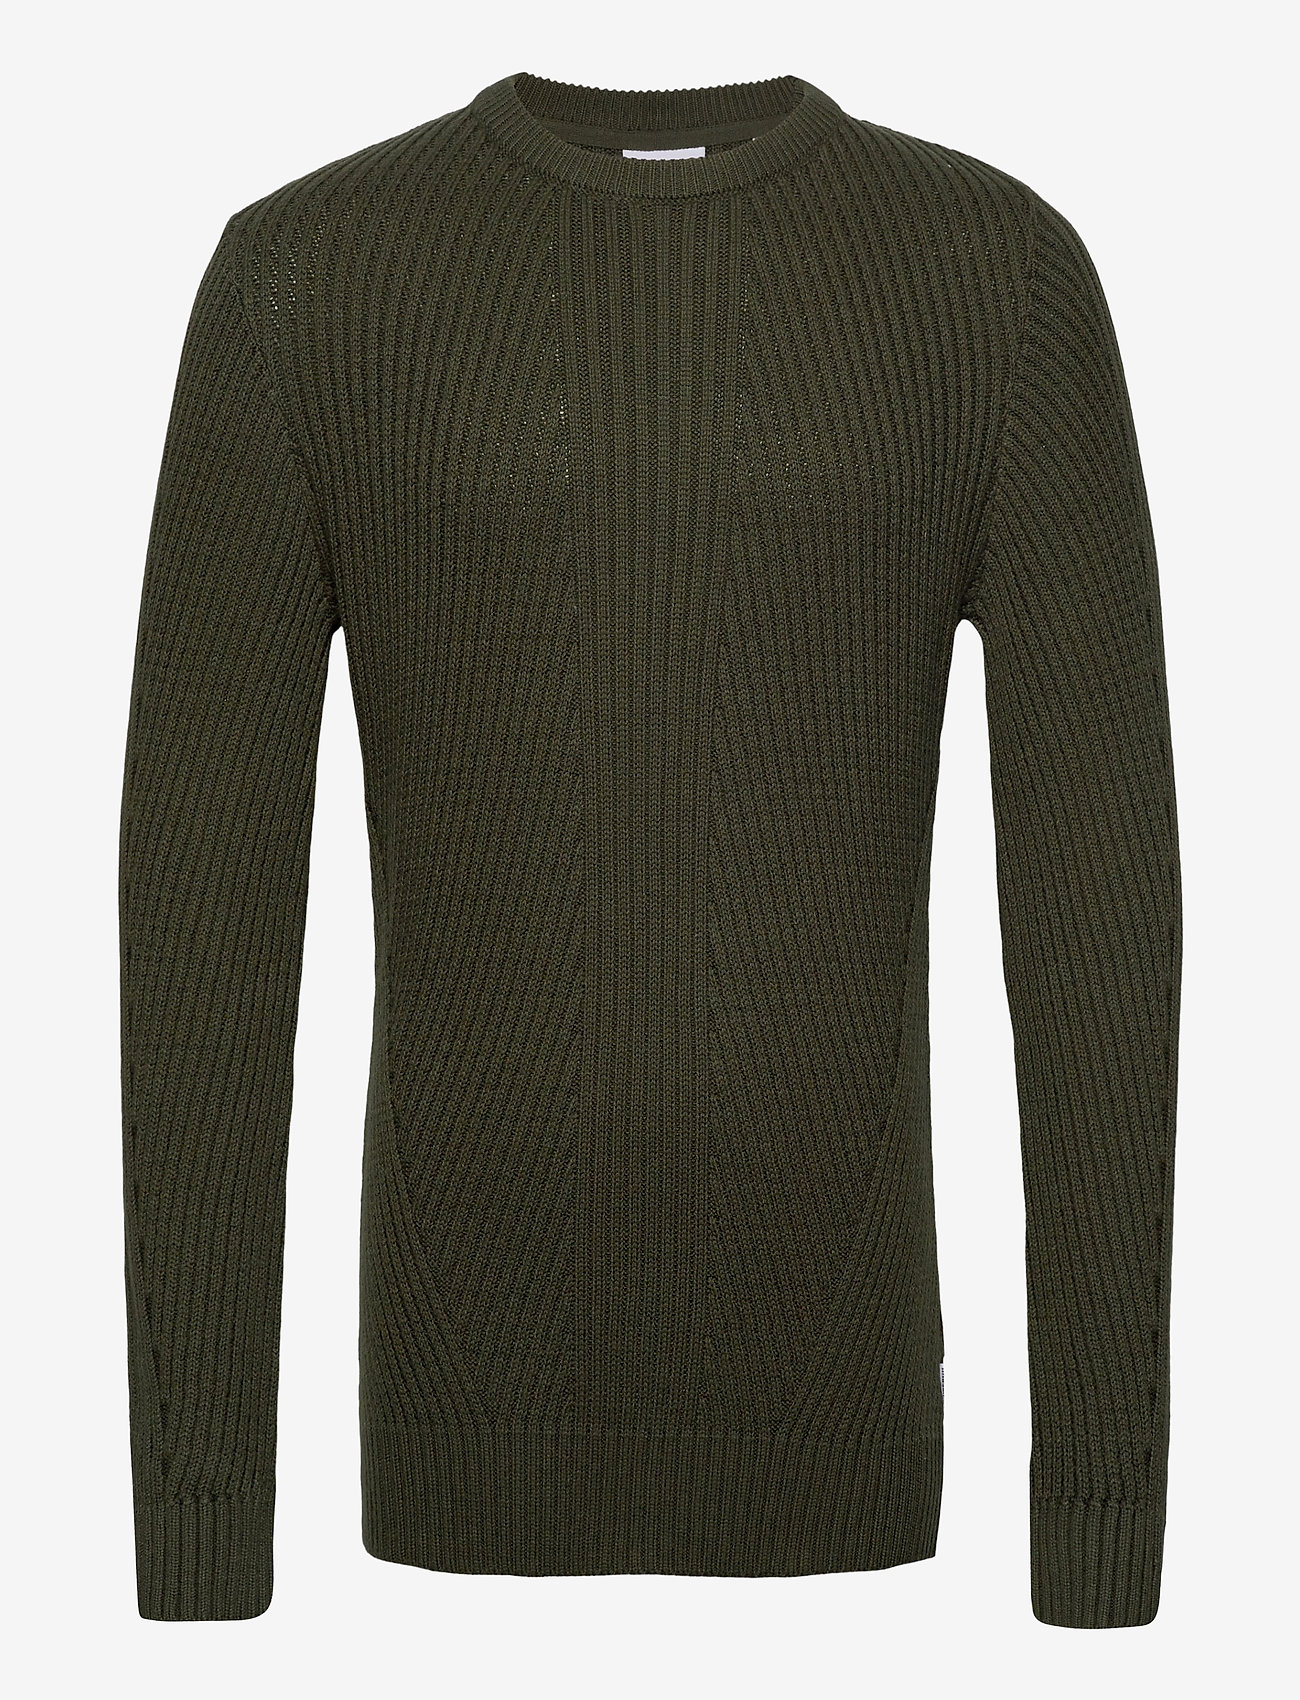 Lindbergh Rib knit - Strikkevarer ARMY - Menn Klær